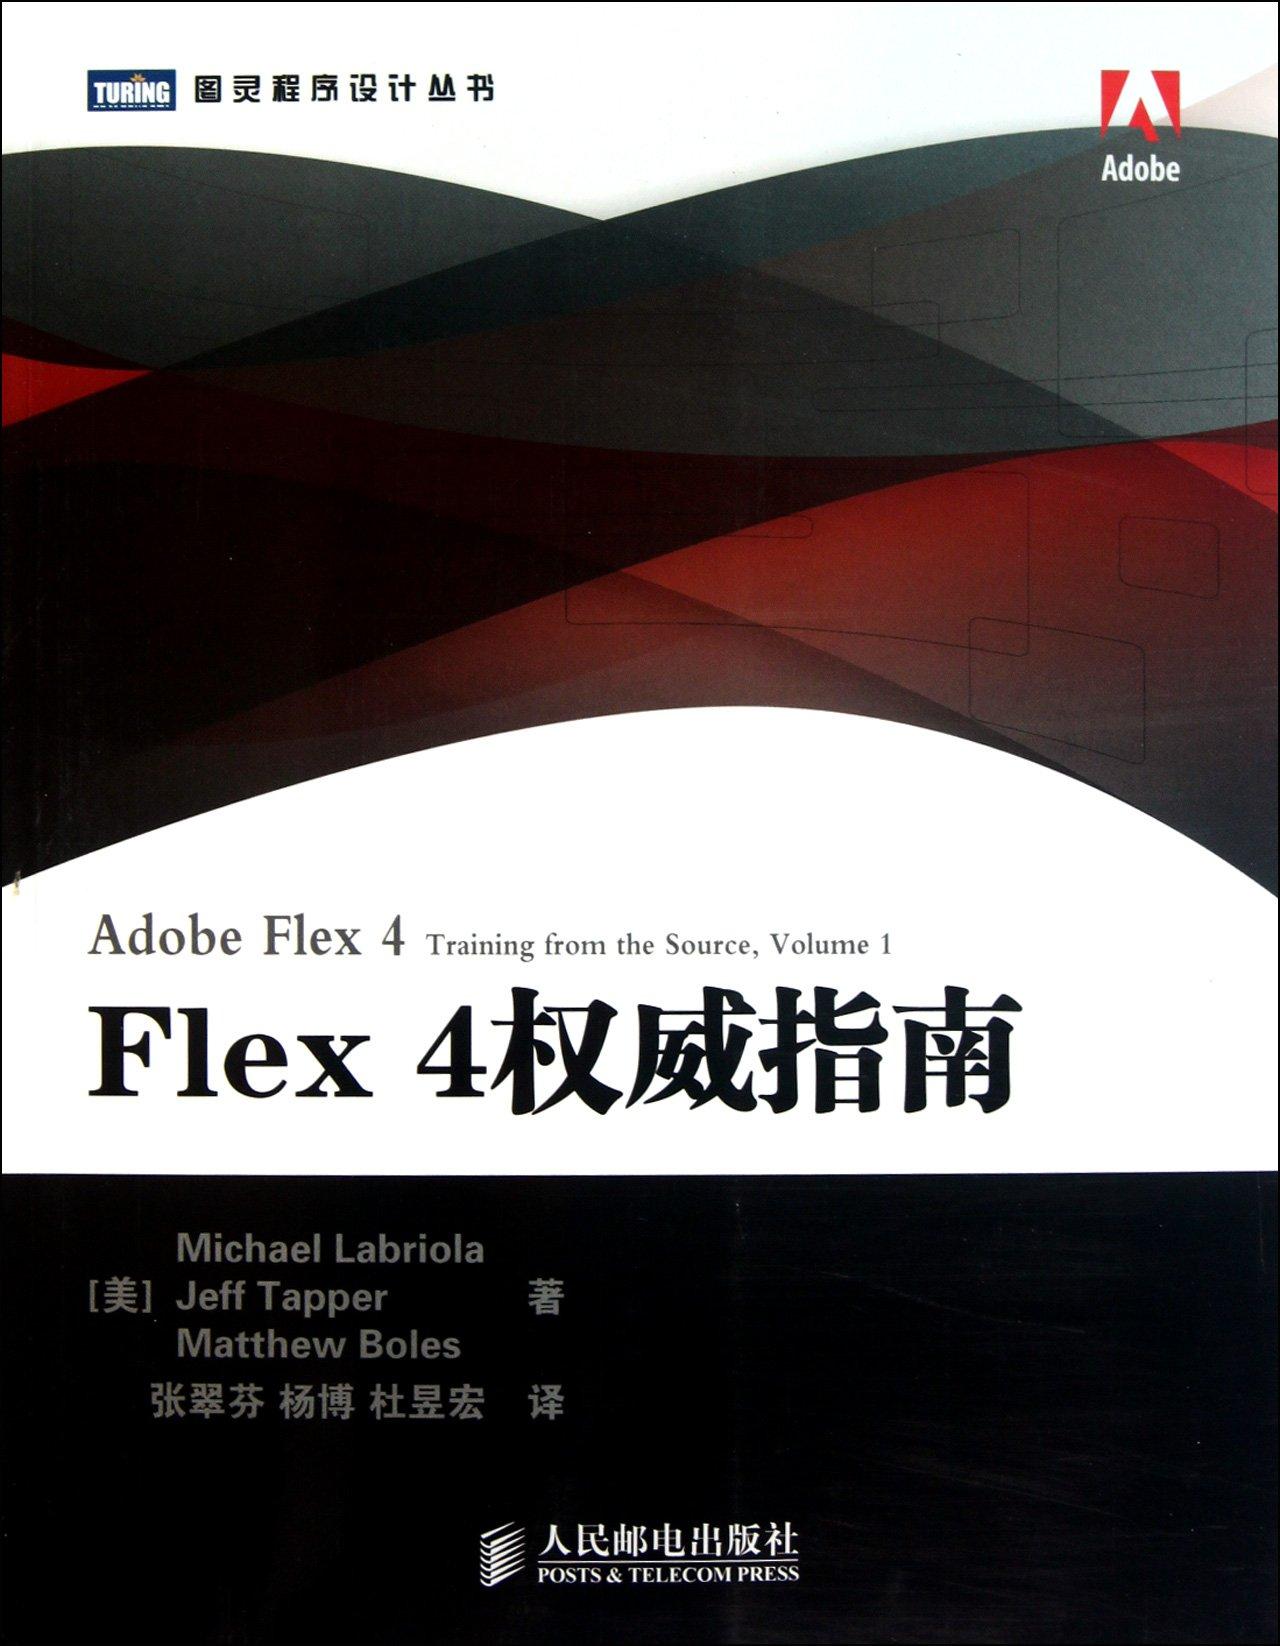 Adobe Flex 4: Training from the Source (Chinese Edition):  [Mei]MichaelLabriolaLingJeffTapperLingMatthewBoles: 9787115252821:  Amazon.com: Books